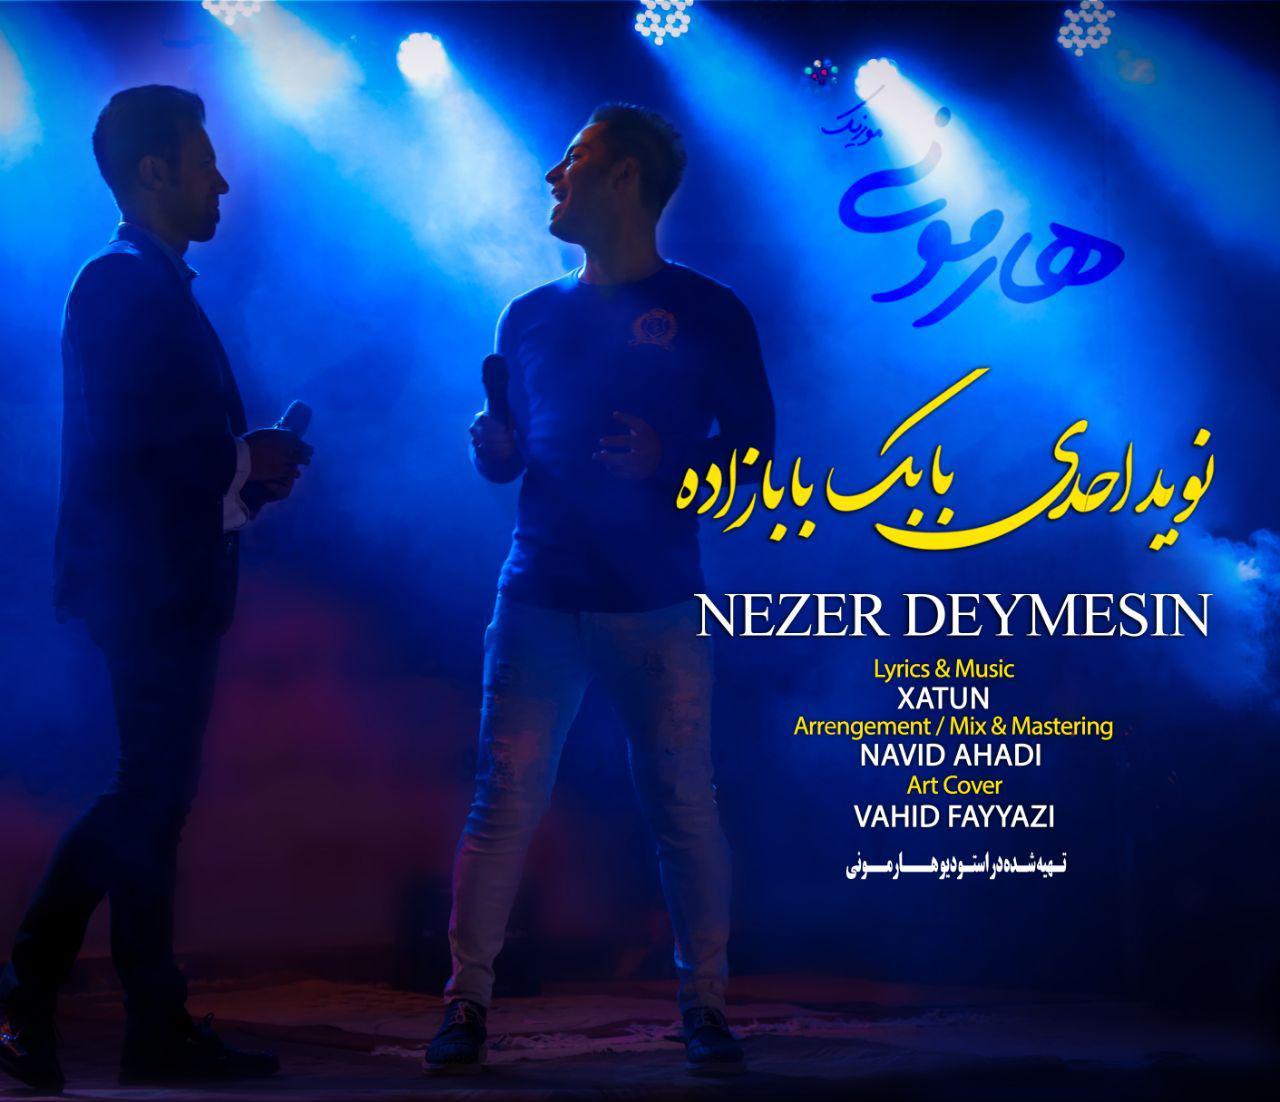 http://s8.picofile.com/file/8299409576/155Navid_Ahadi_Babak_Babazadeh_Nezer_Deymesin.jpg